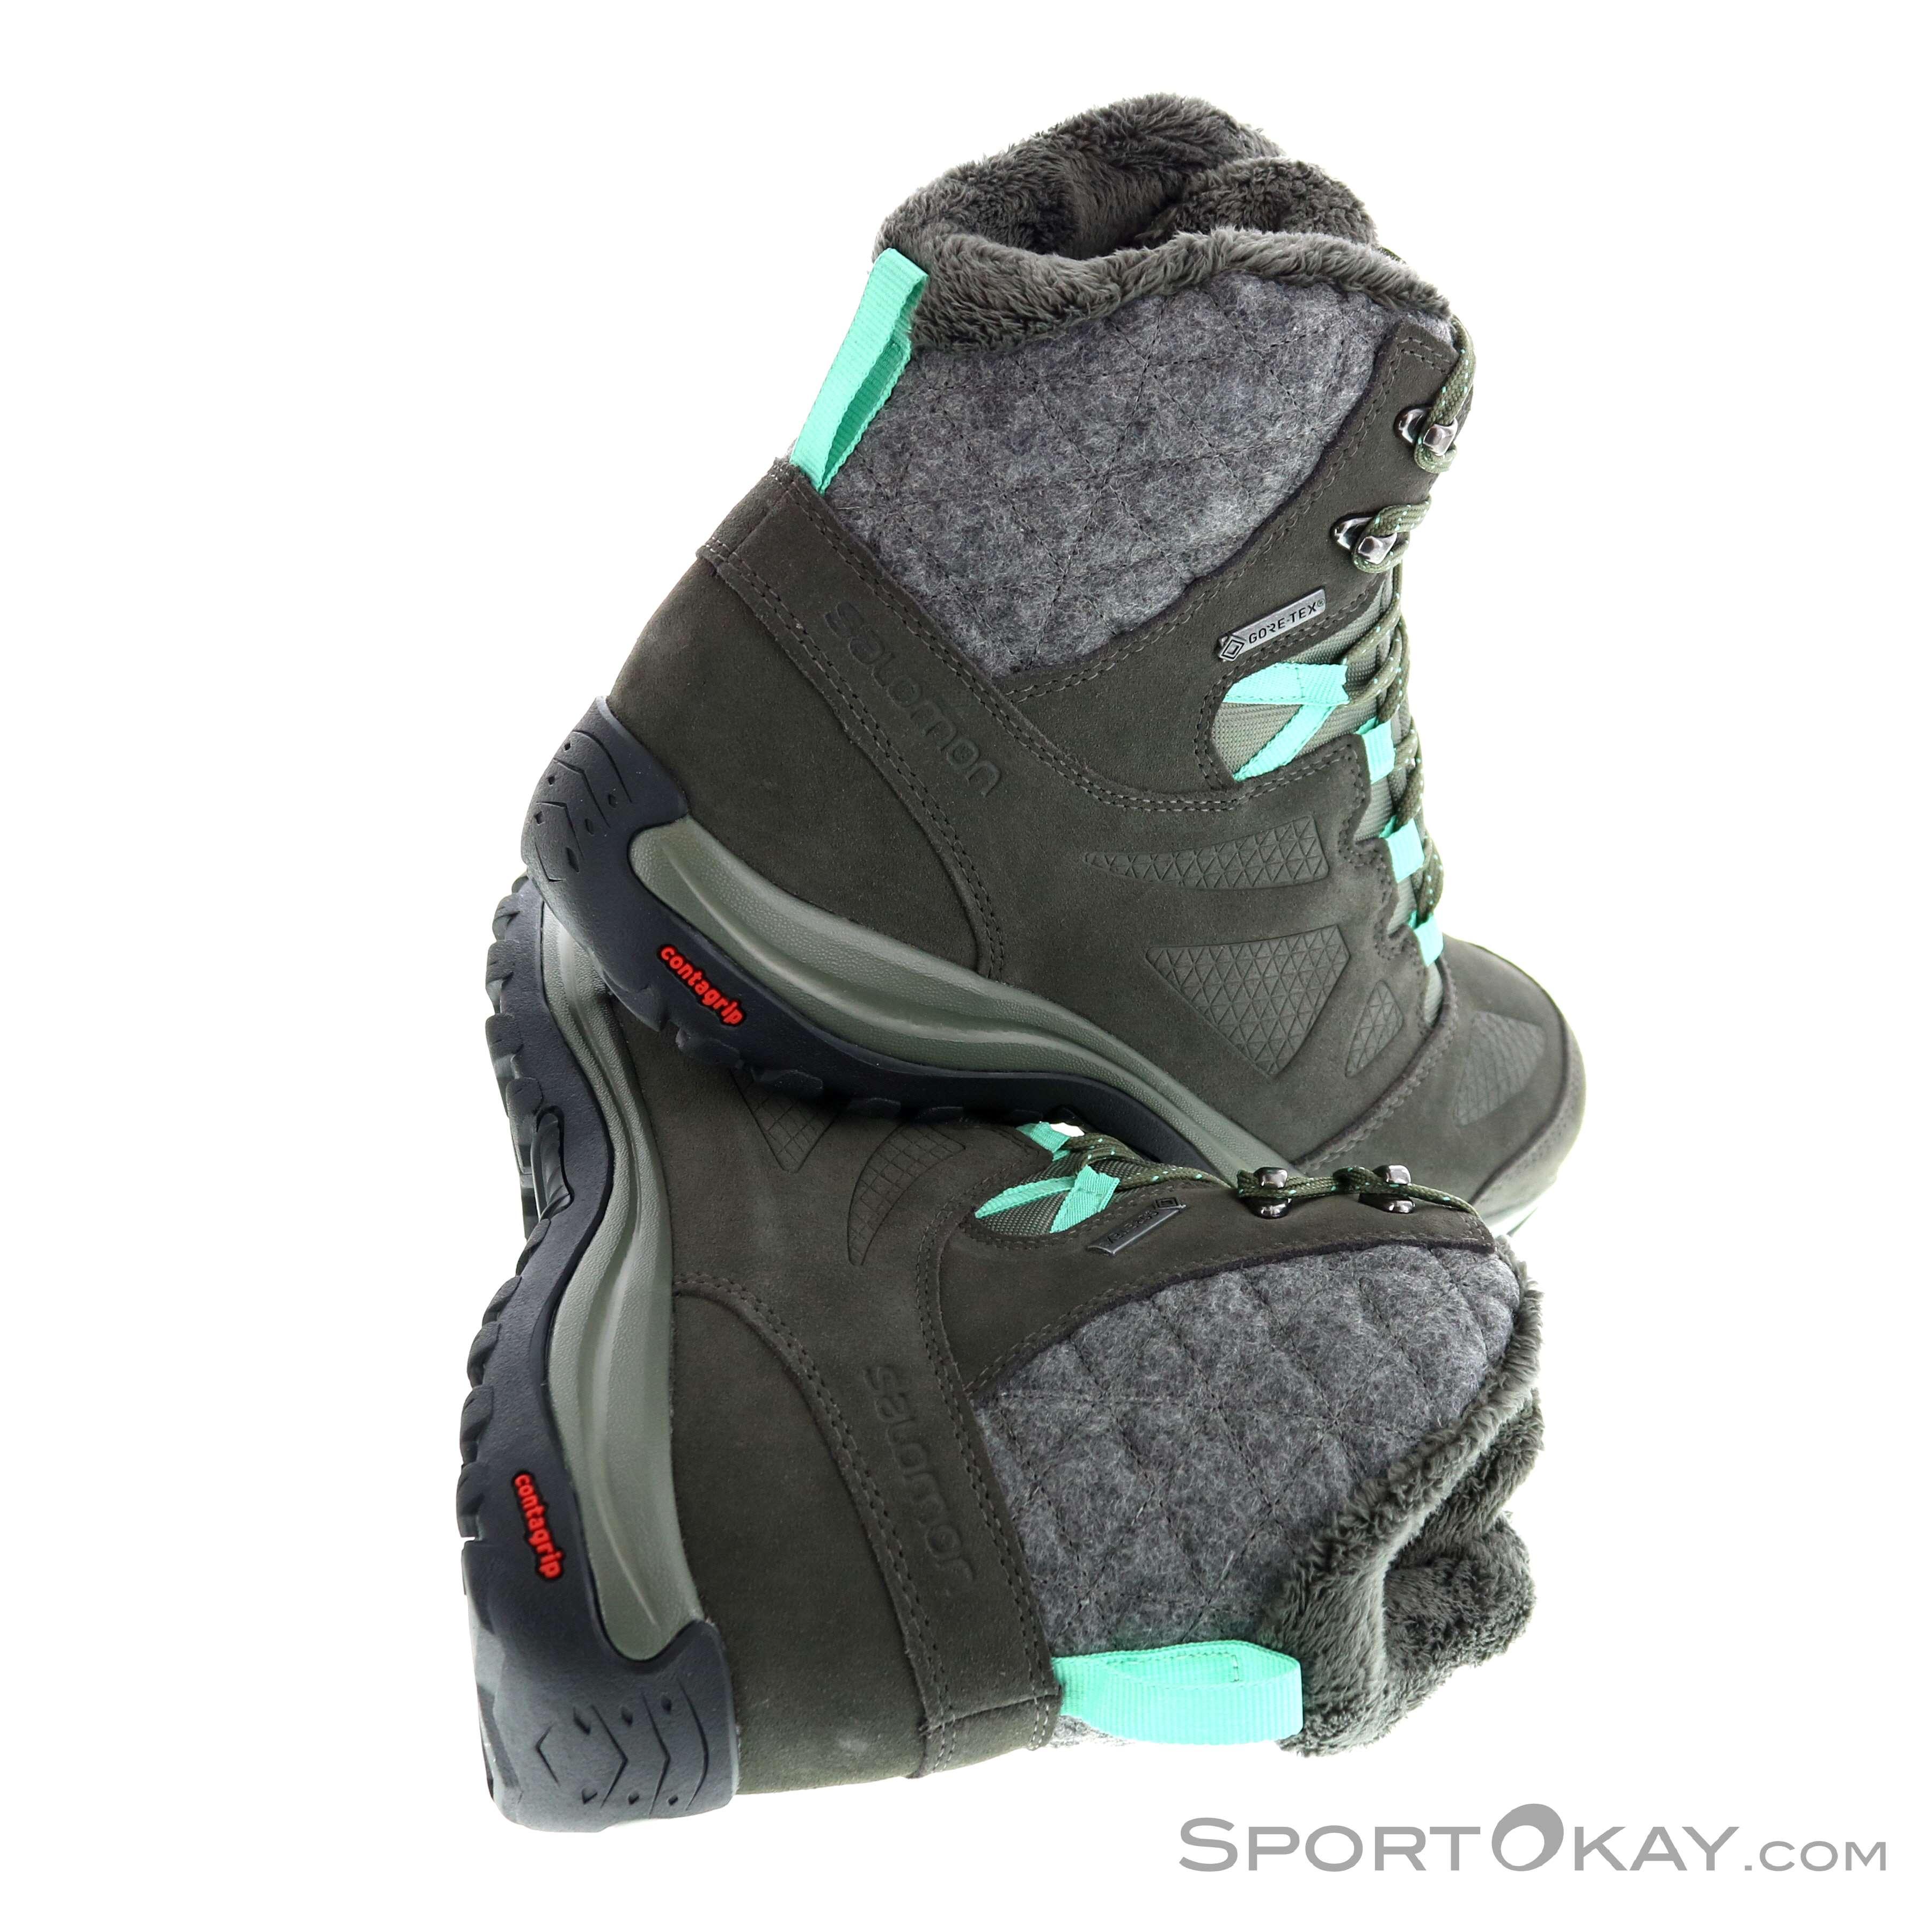 Gtx Winter Tex Shoes Salomon Ellipse Womens Gore vn0Nwm8O